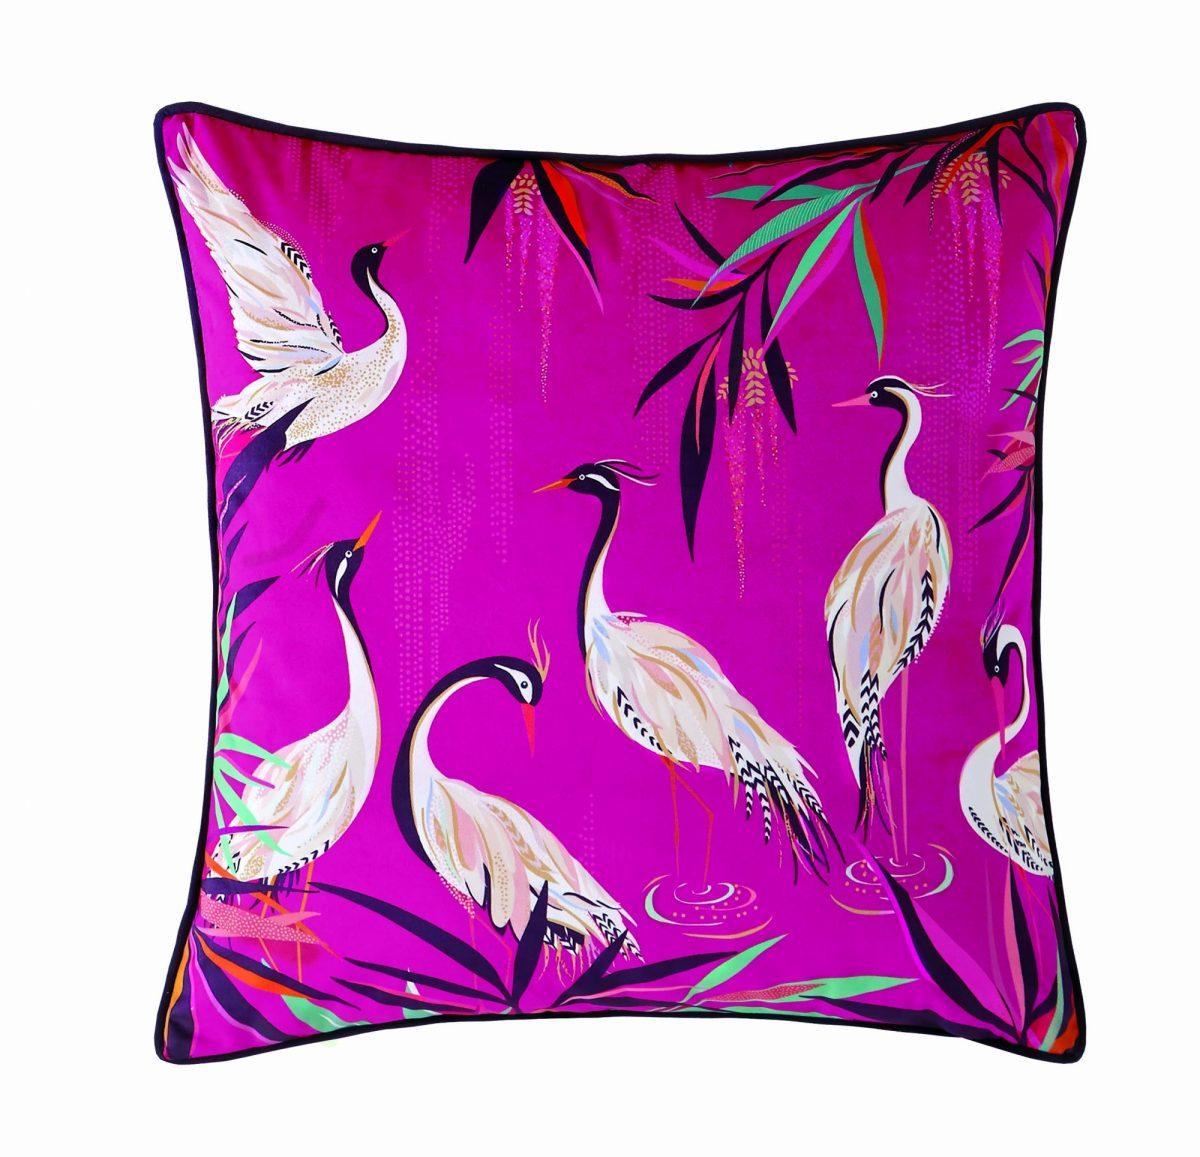 Heron Pink Cushion 50x50 1